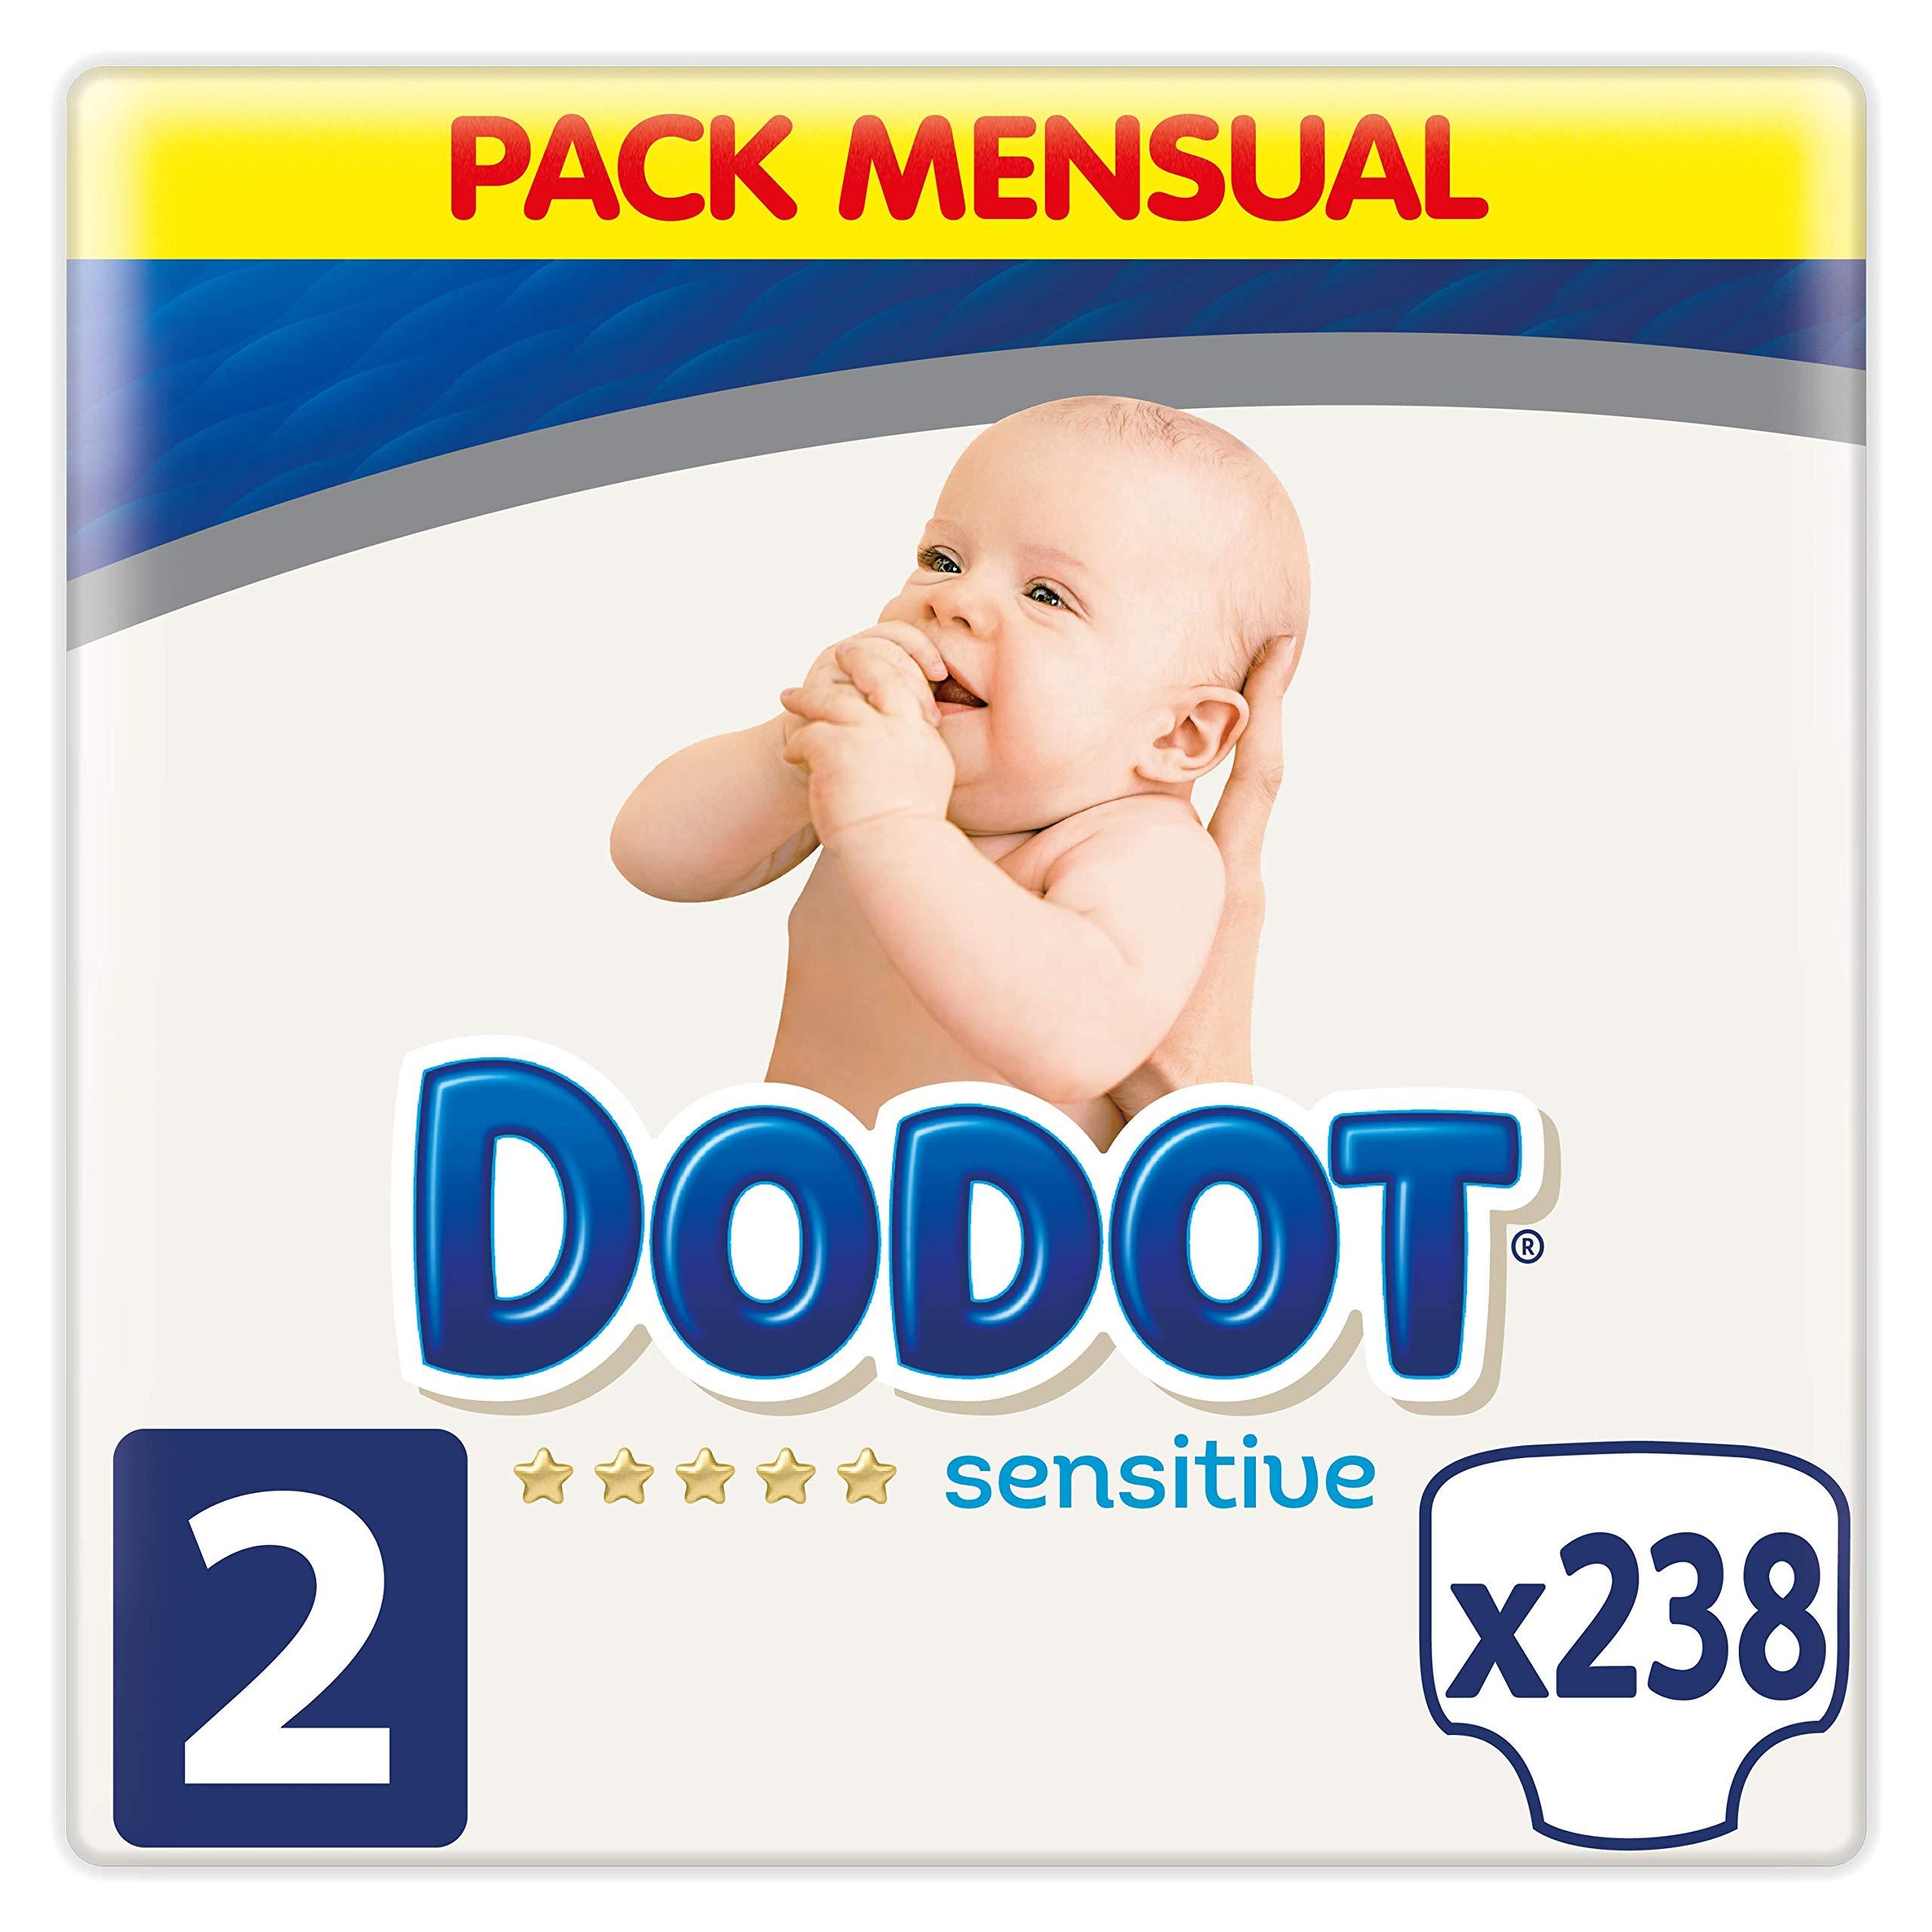 Dodot Sensitive - Pañales, Talla 2 (4-8 kg), 238 pañales